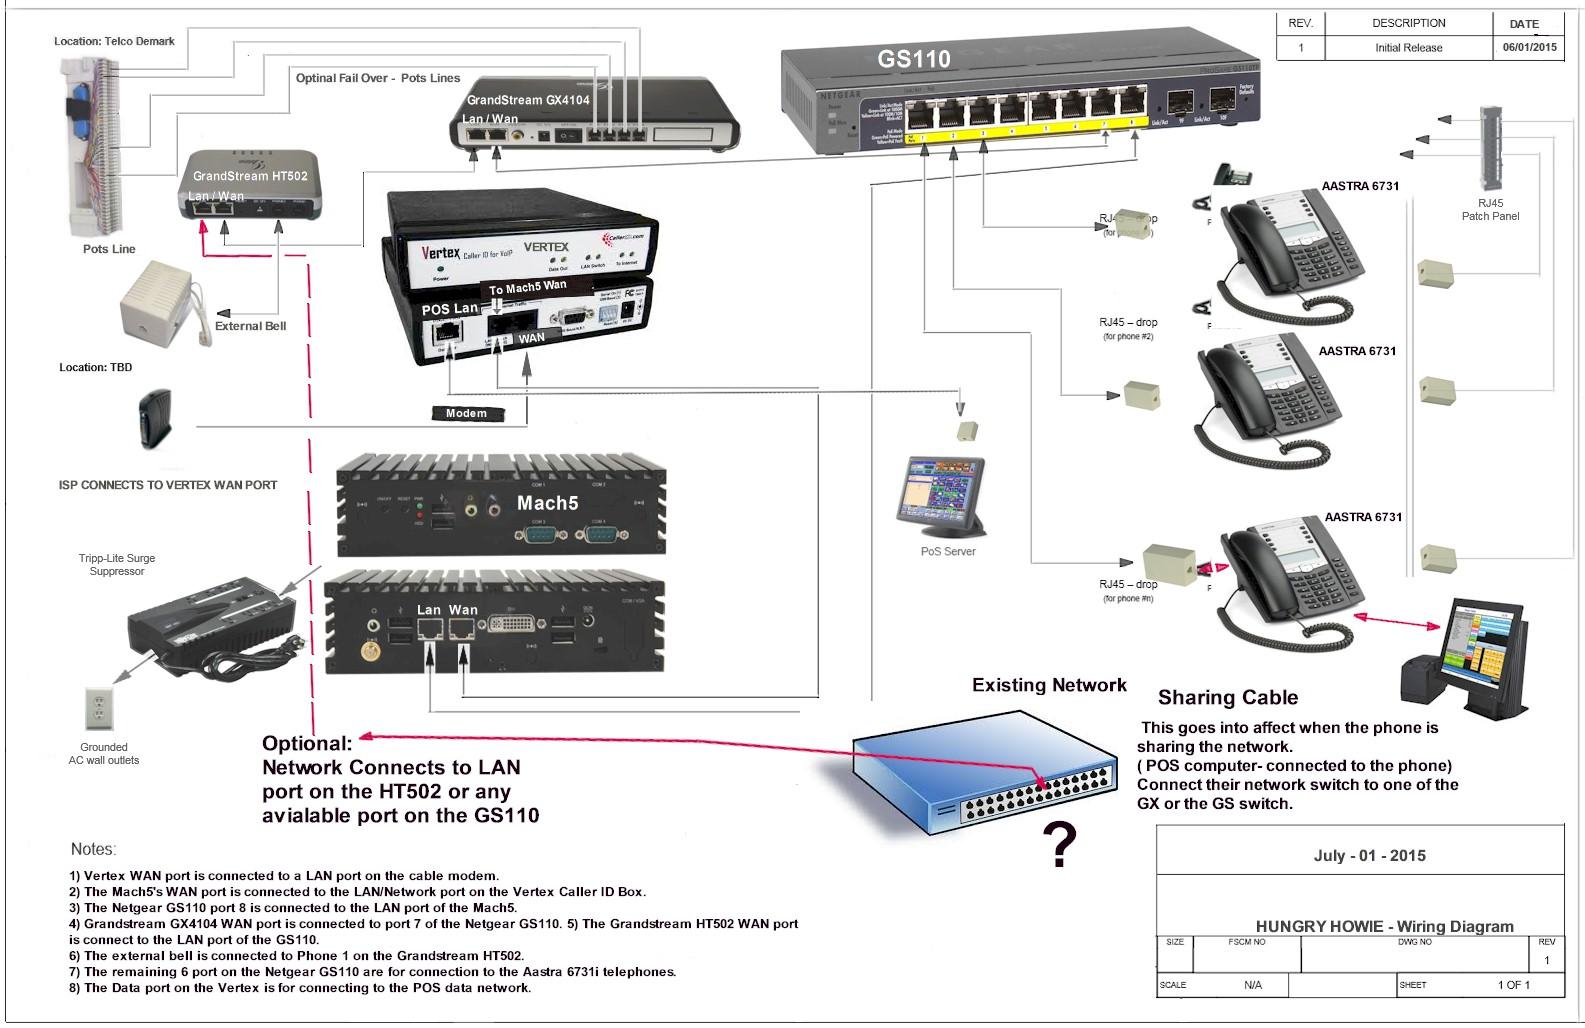 wan wiring diagram wiring diagrams lolhungry howie wiring diagram modem diagram 1 vertex wan port [ 1585 x 1028 Pixel ]